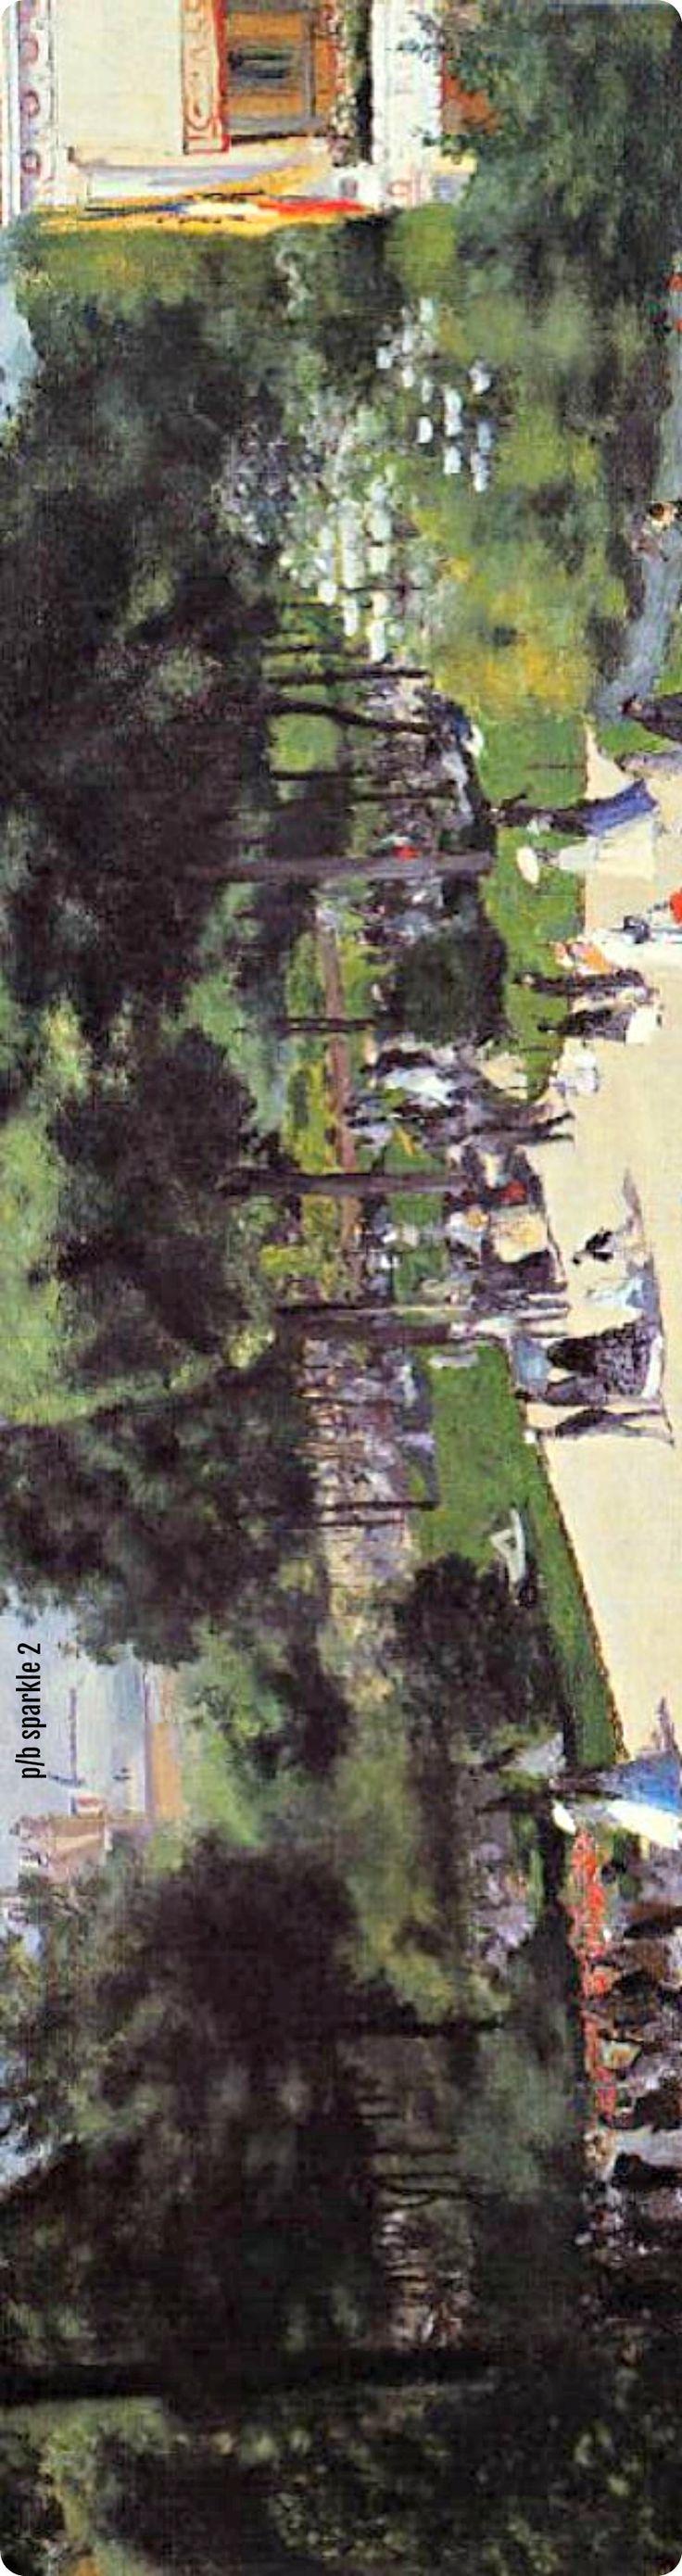 Pierre-Auguste Renoir (1841-1919): The Champs Elysees during the Paris Fair of 1867, 1867